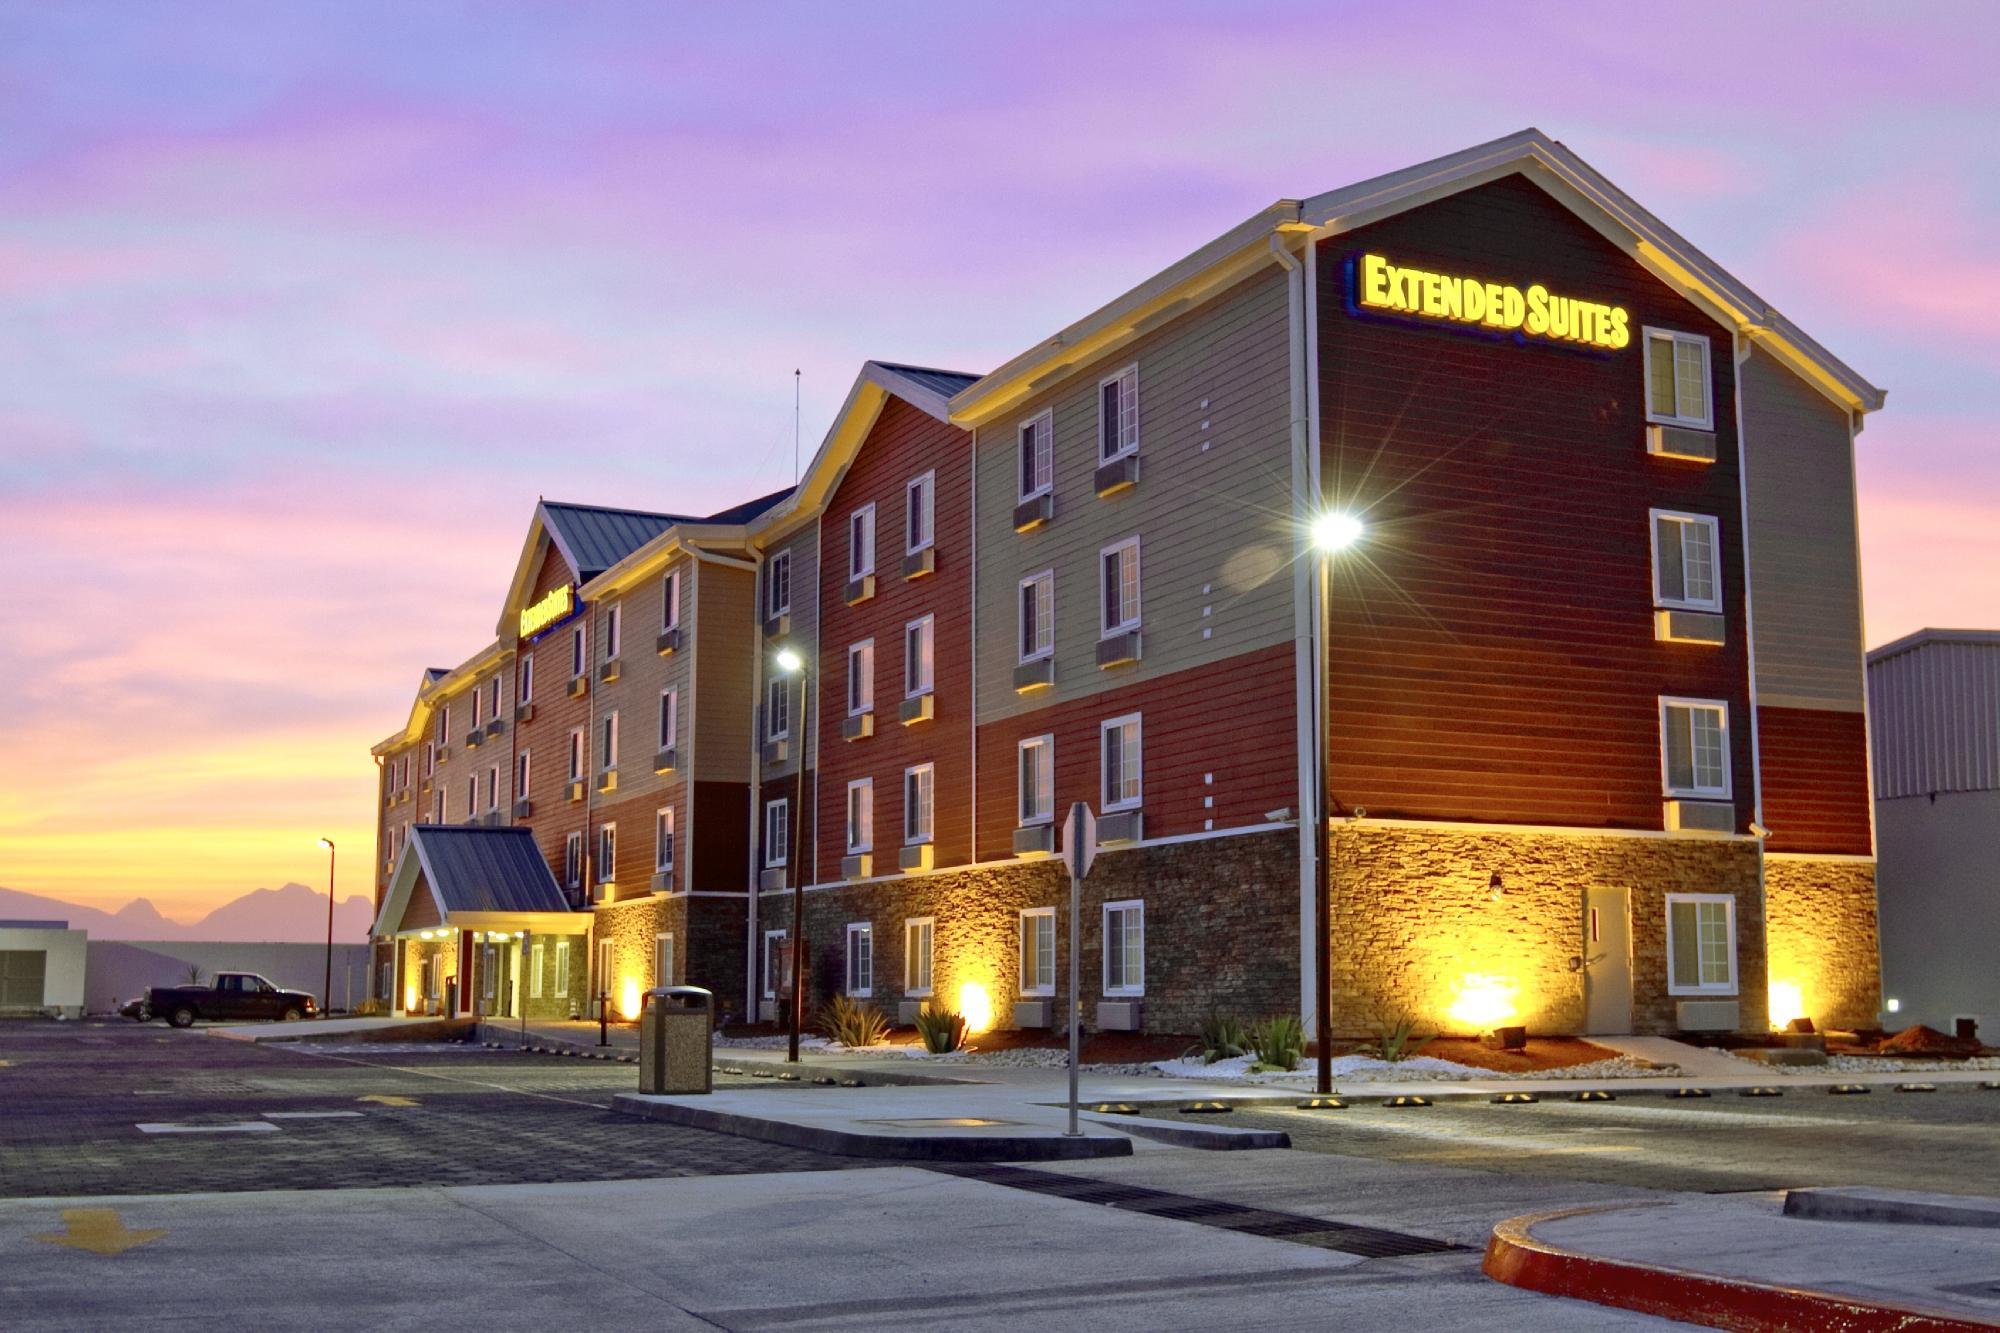 Extended Suites Monterrey